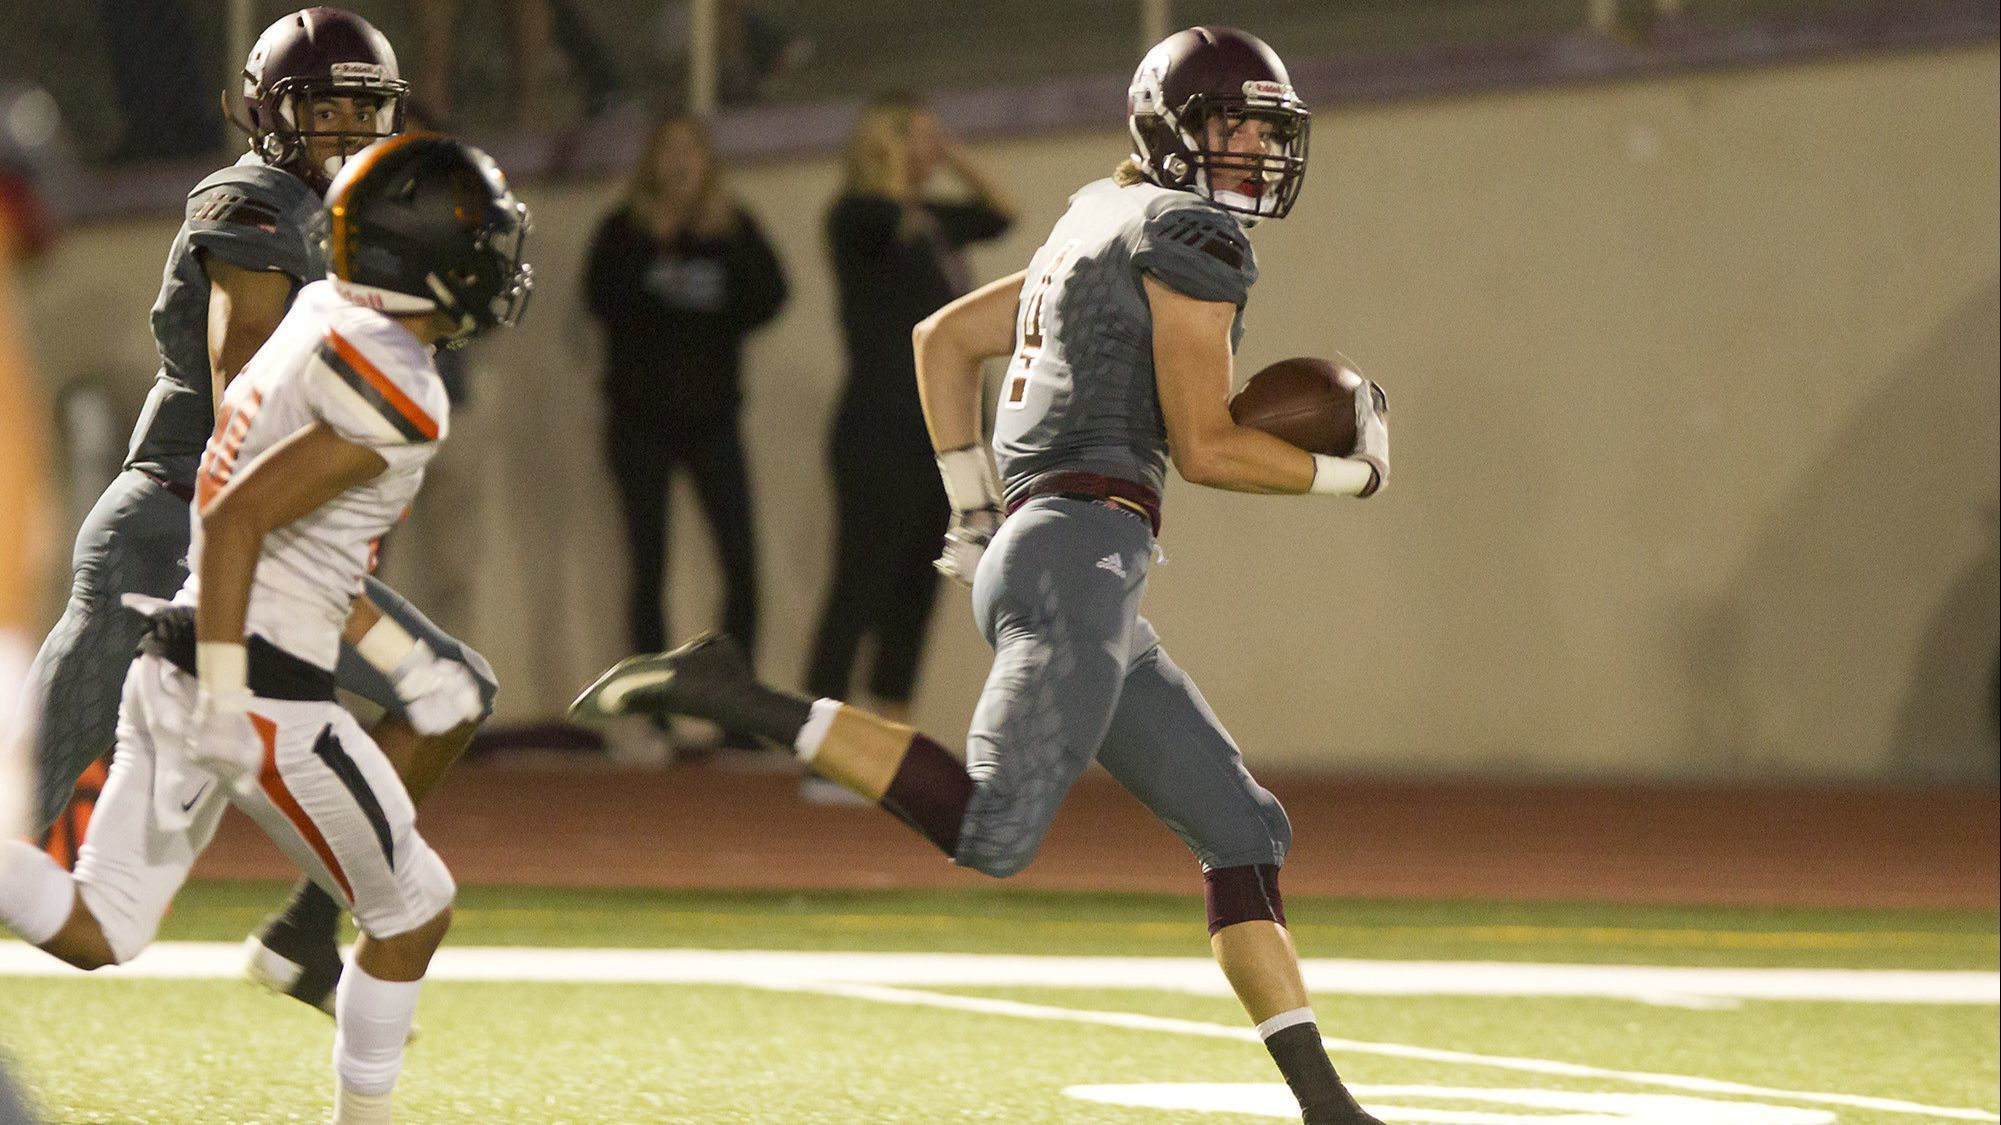 Week 1 High School Football Preview: Laguna Beach vs Glendale Hoover